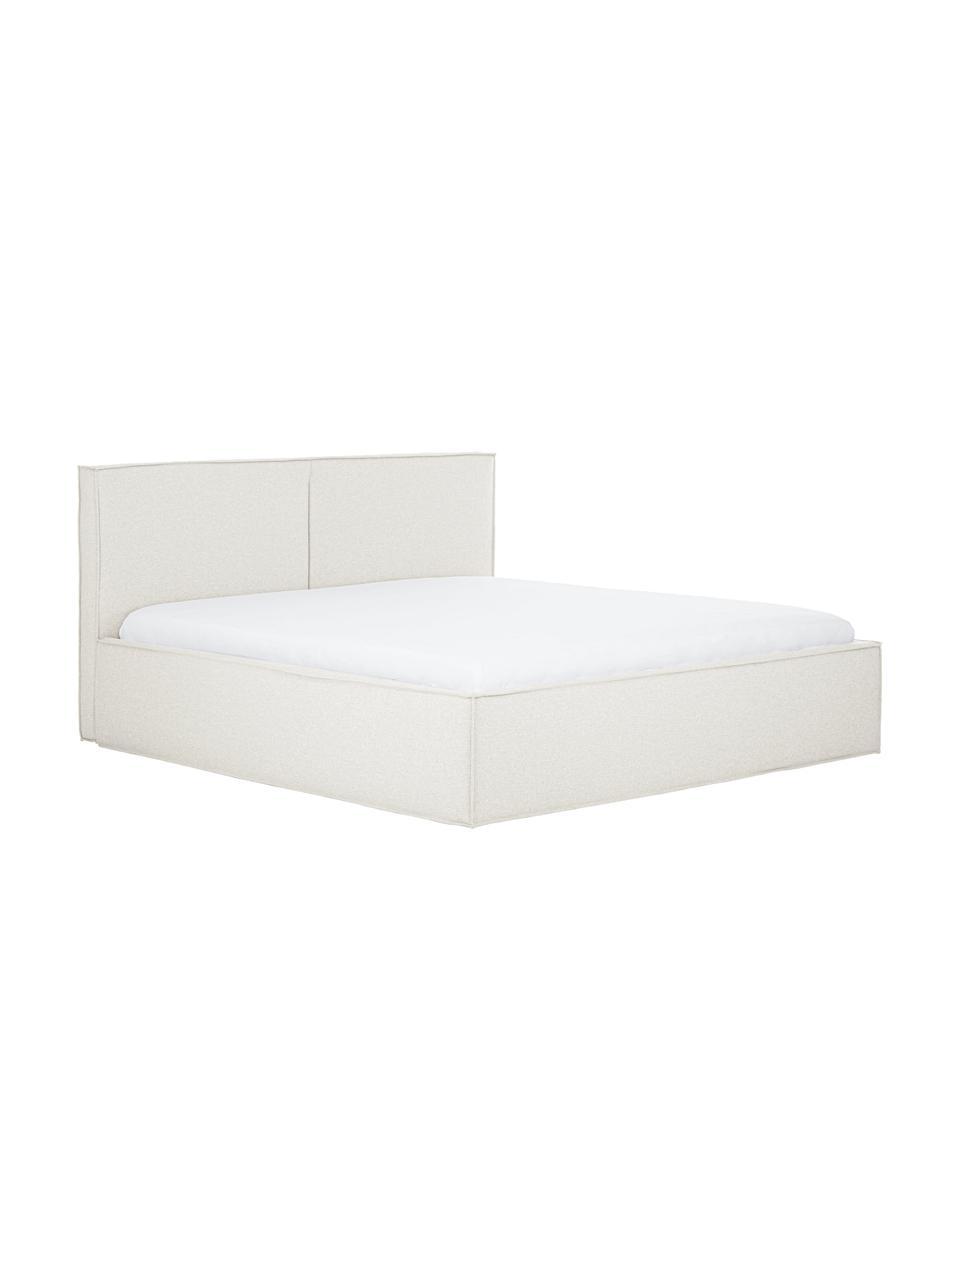 Gestoffeerd bed Dream met opbergruimte in crèmewit, Frame: massief grenenhout en pla, Bekleding: 100% polyester (gestructu, Geweven stof crèmewit, 180 x 200 cm